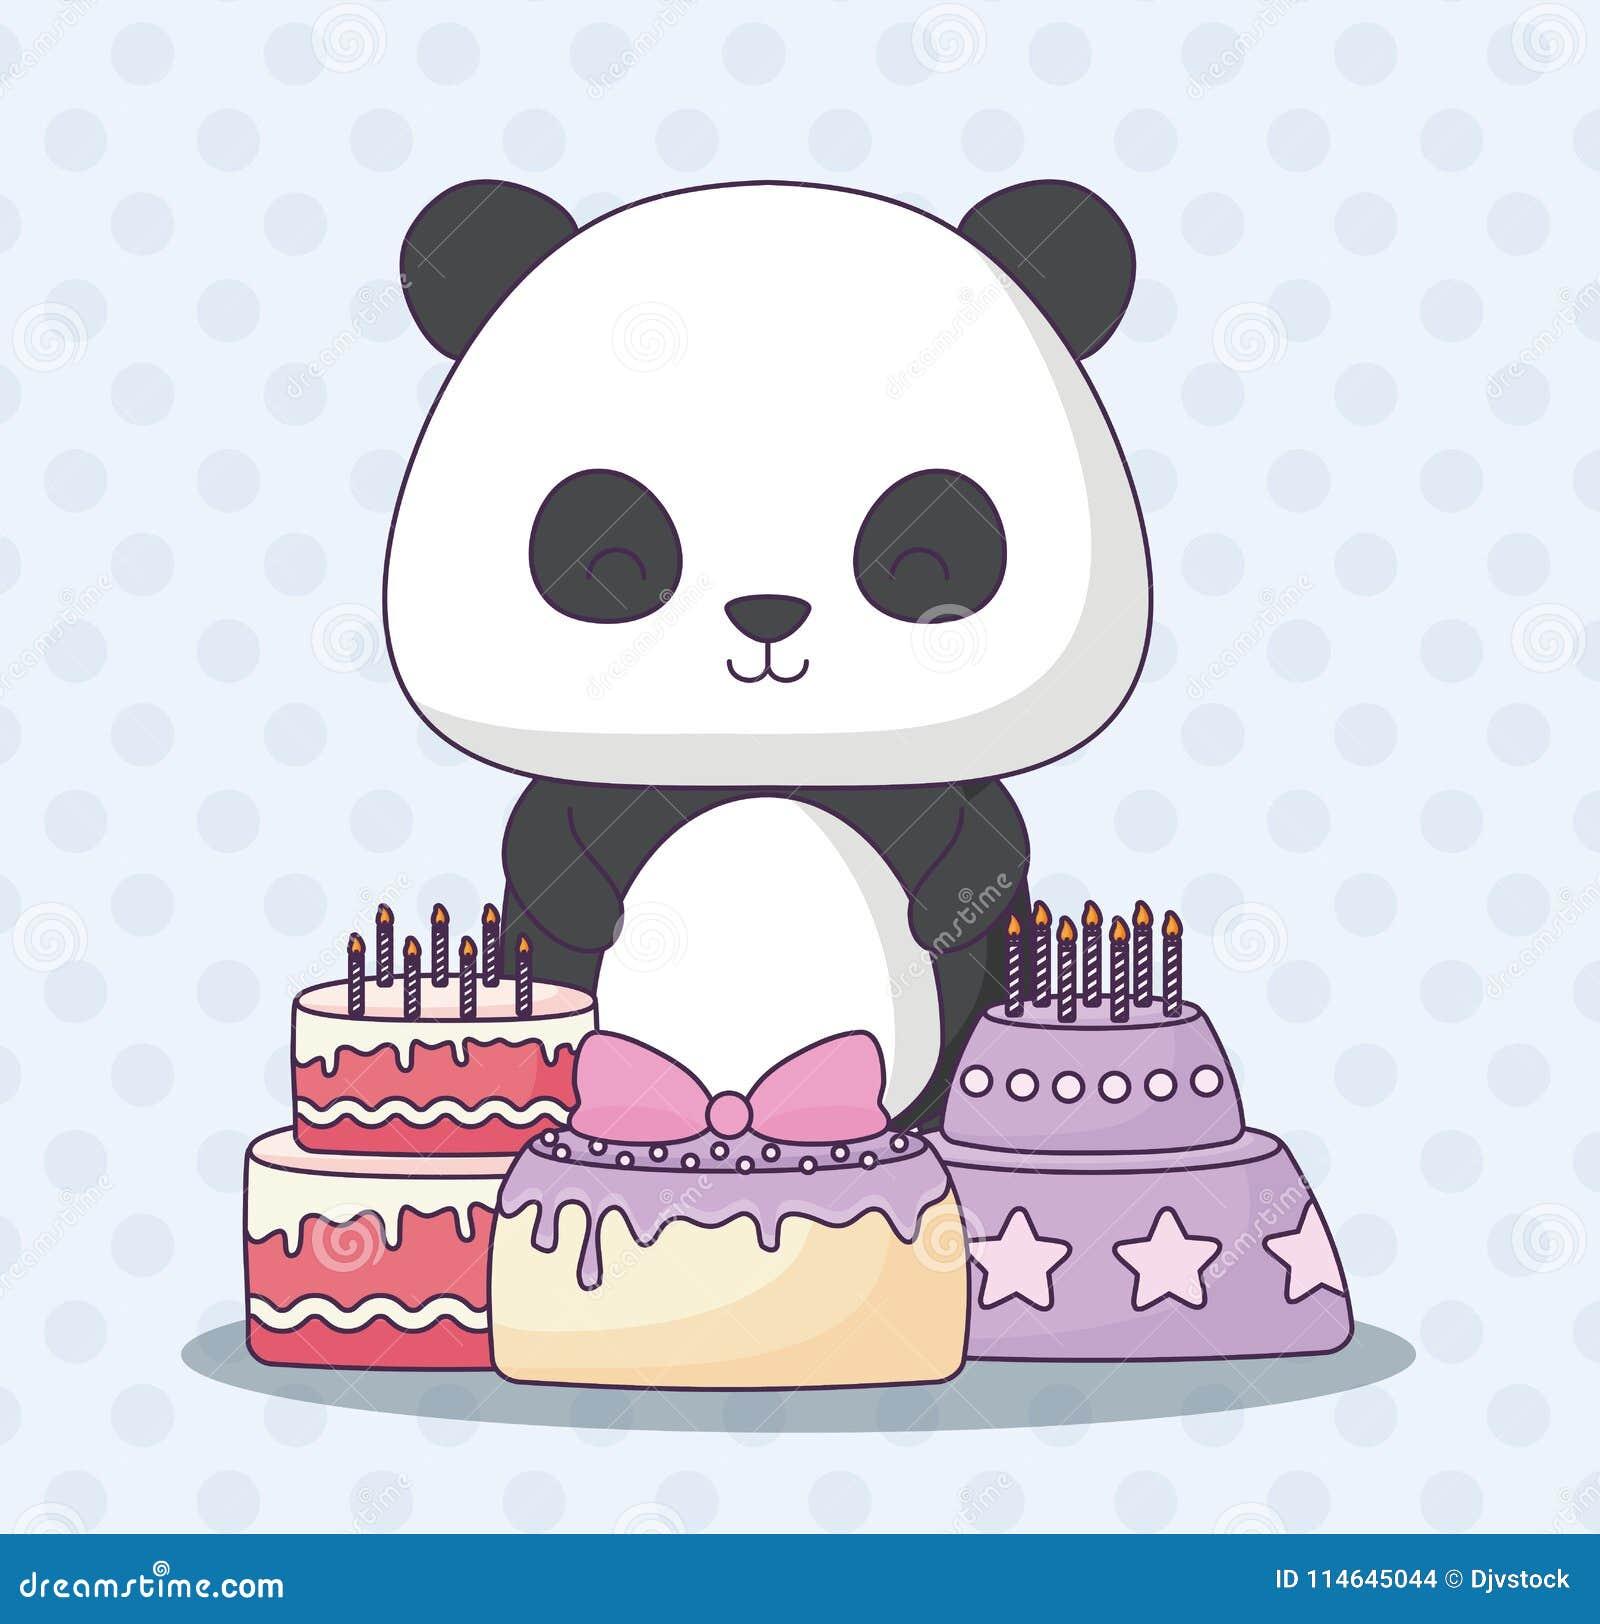 Happy Birthday Design Stock Vector Illustration Of Lively 114645044